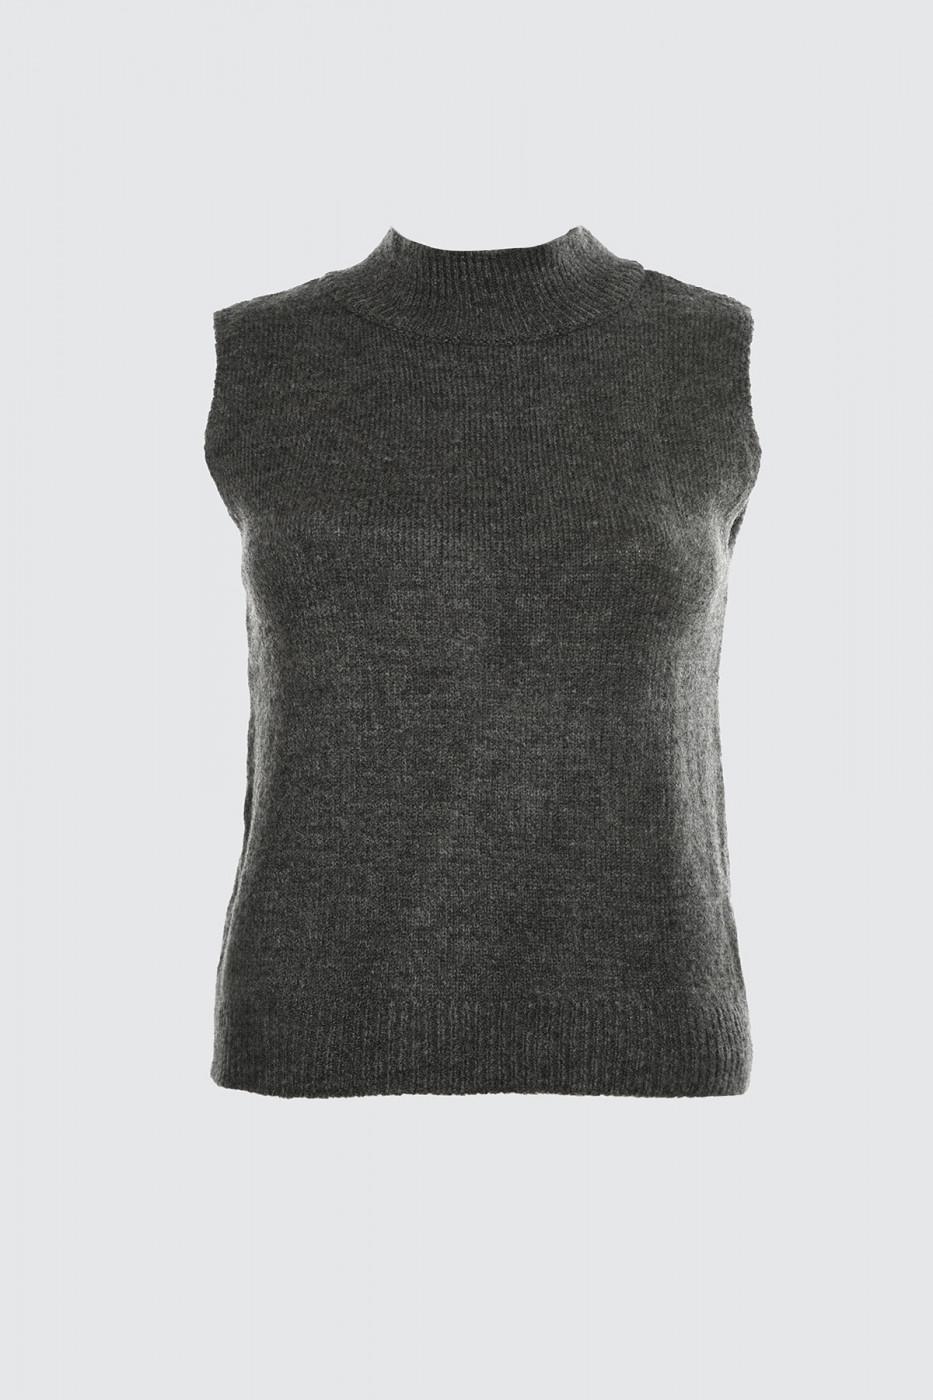 Trendyol Anthracite Upright Collar Sleeveless Knit Sweater